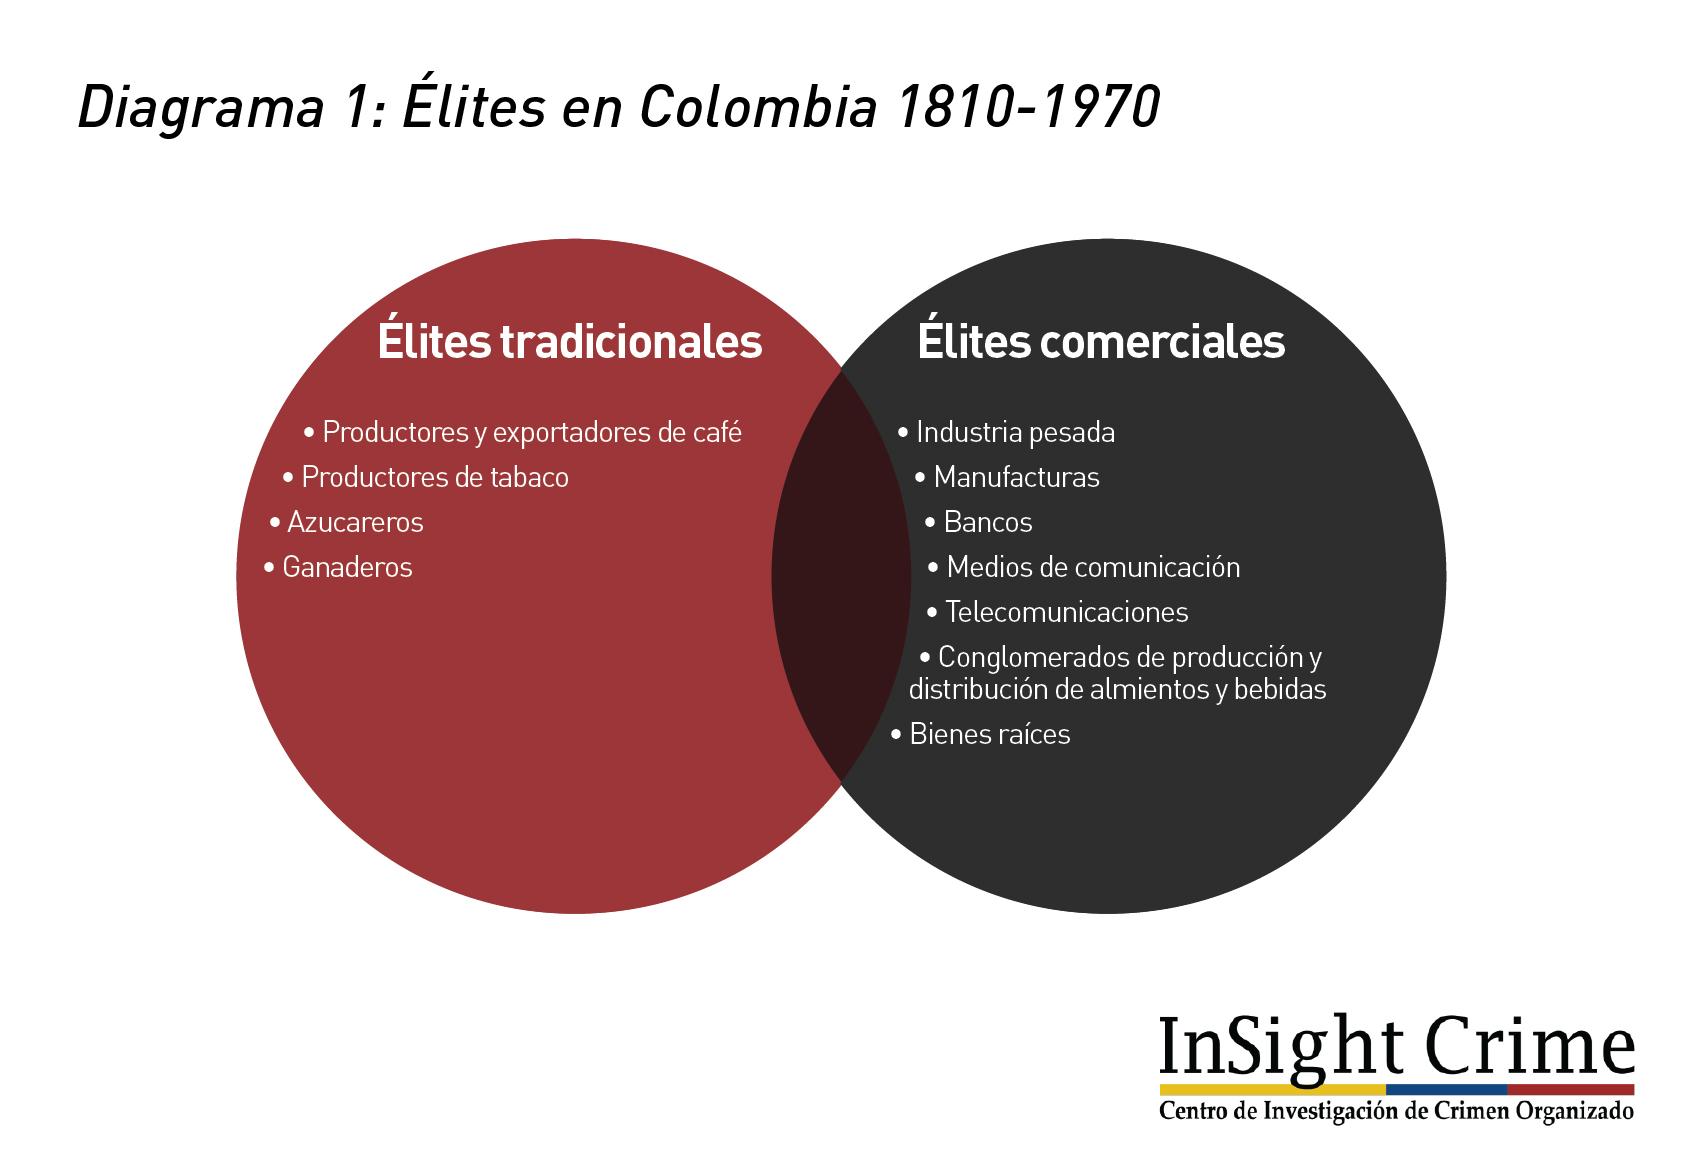 Diagrama1 Colombia Elite 1810 1970